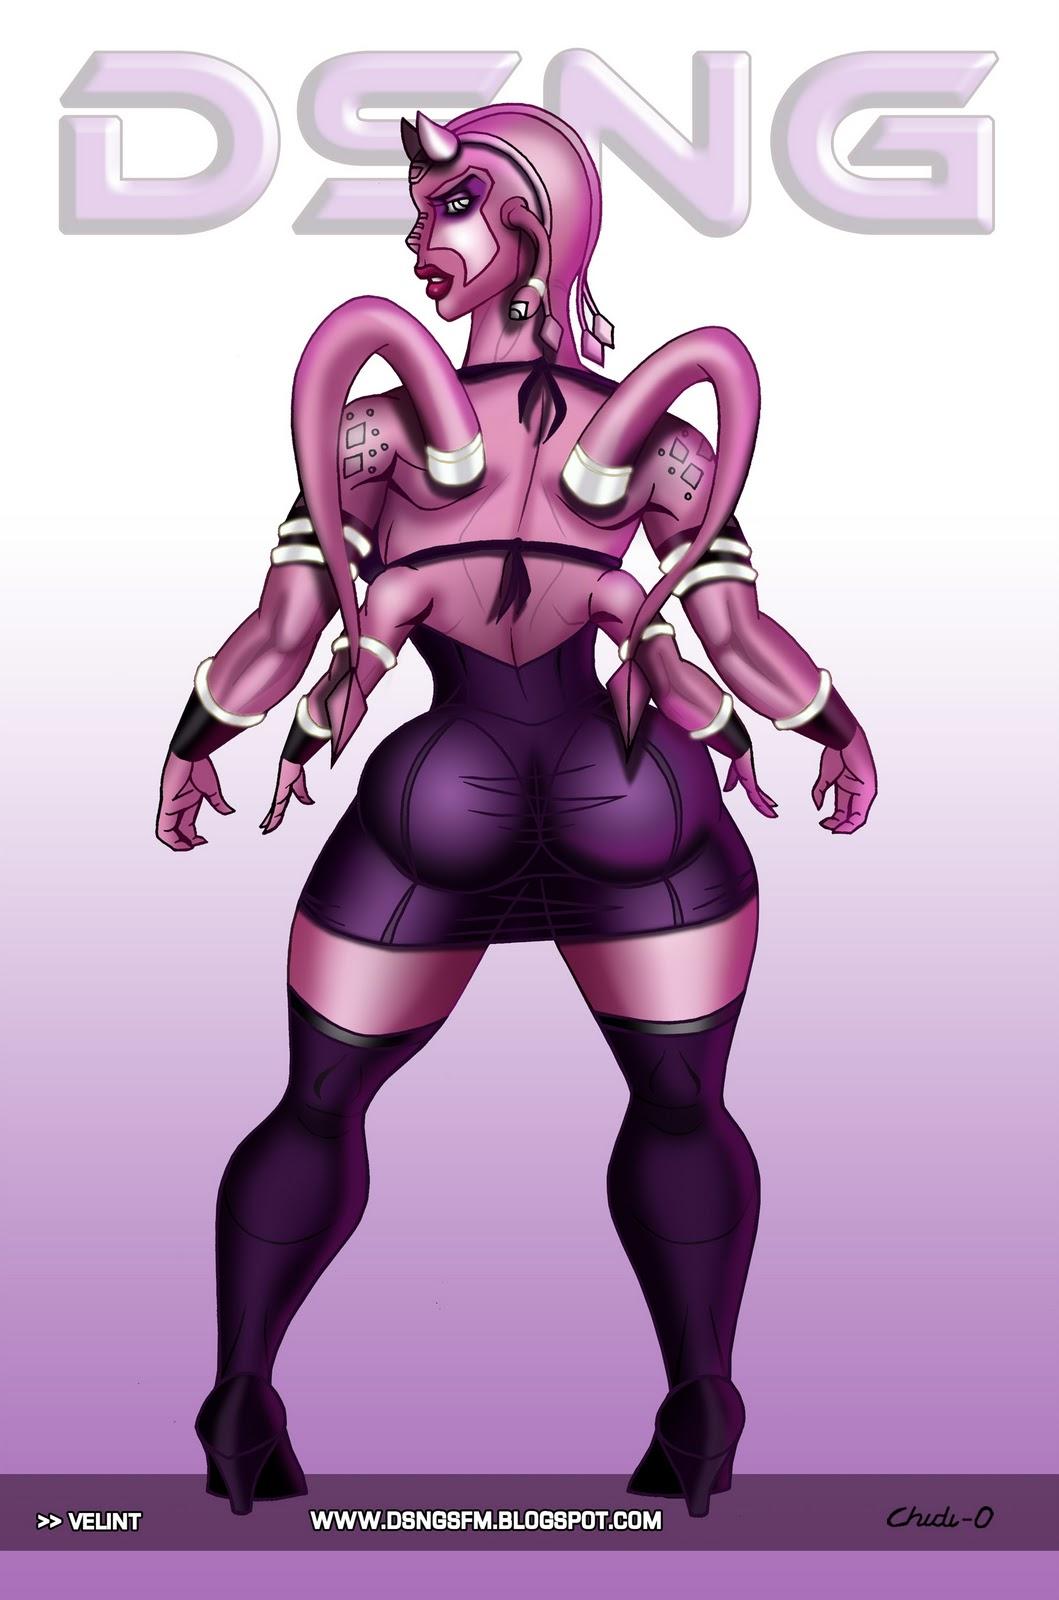 http://1.bp.blogspot.com/-NdFRSaQQRlQ/TyYaYDLXj_I/AAAAAAAADgc/UOBTHqTZ0SM/s1600/Velint+veraguddon+3+pop+diva+nicki+minaj+britney+spears+big+booty+fat+phat+ass+whooty+pinky+scalatan+sexy+female+alien+by+dsng+chronicles+anime+drawing+pinup.jpg